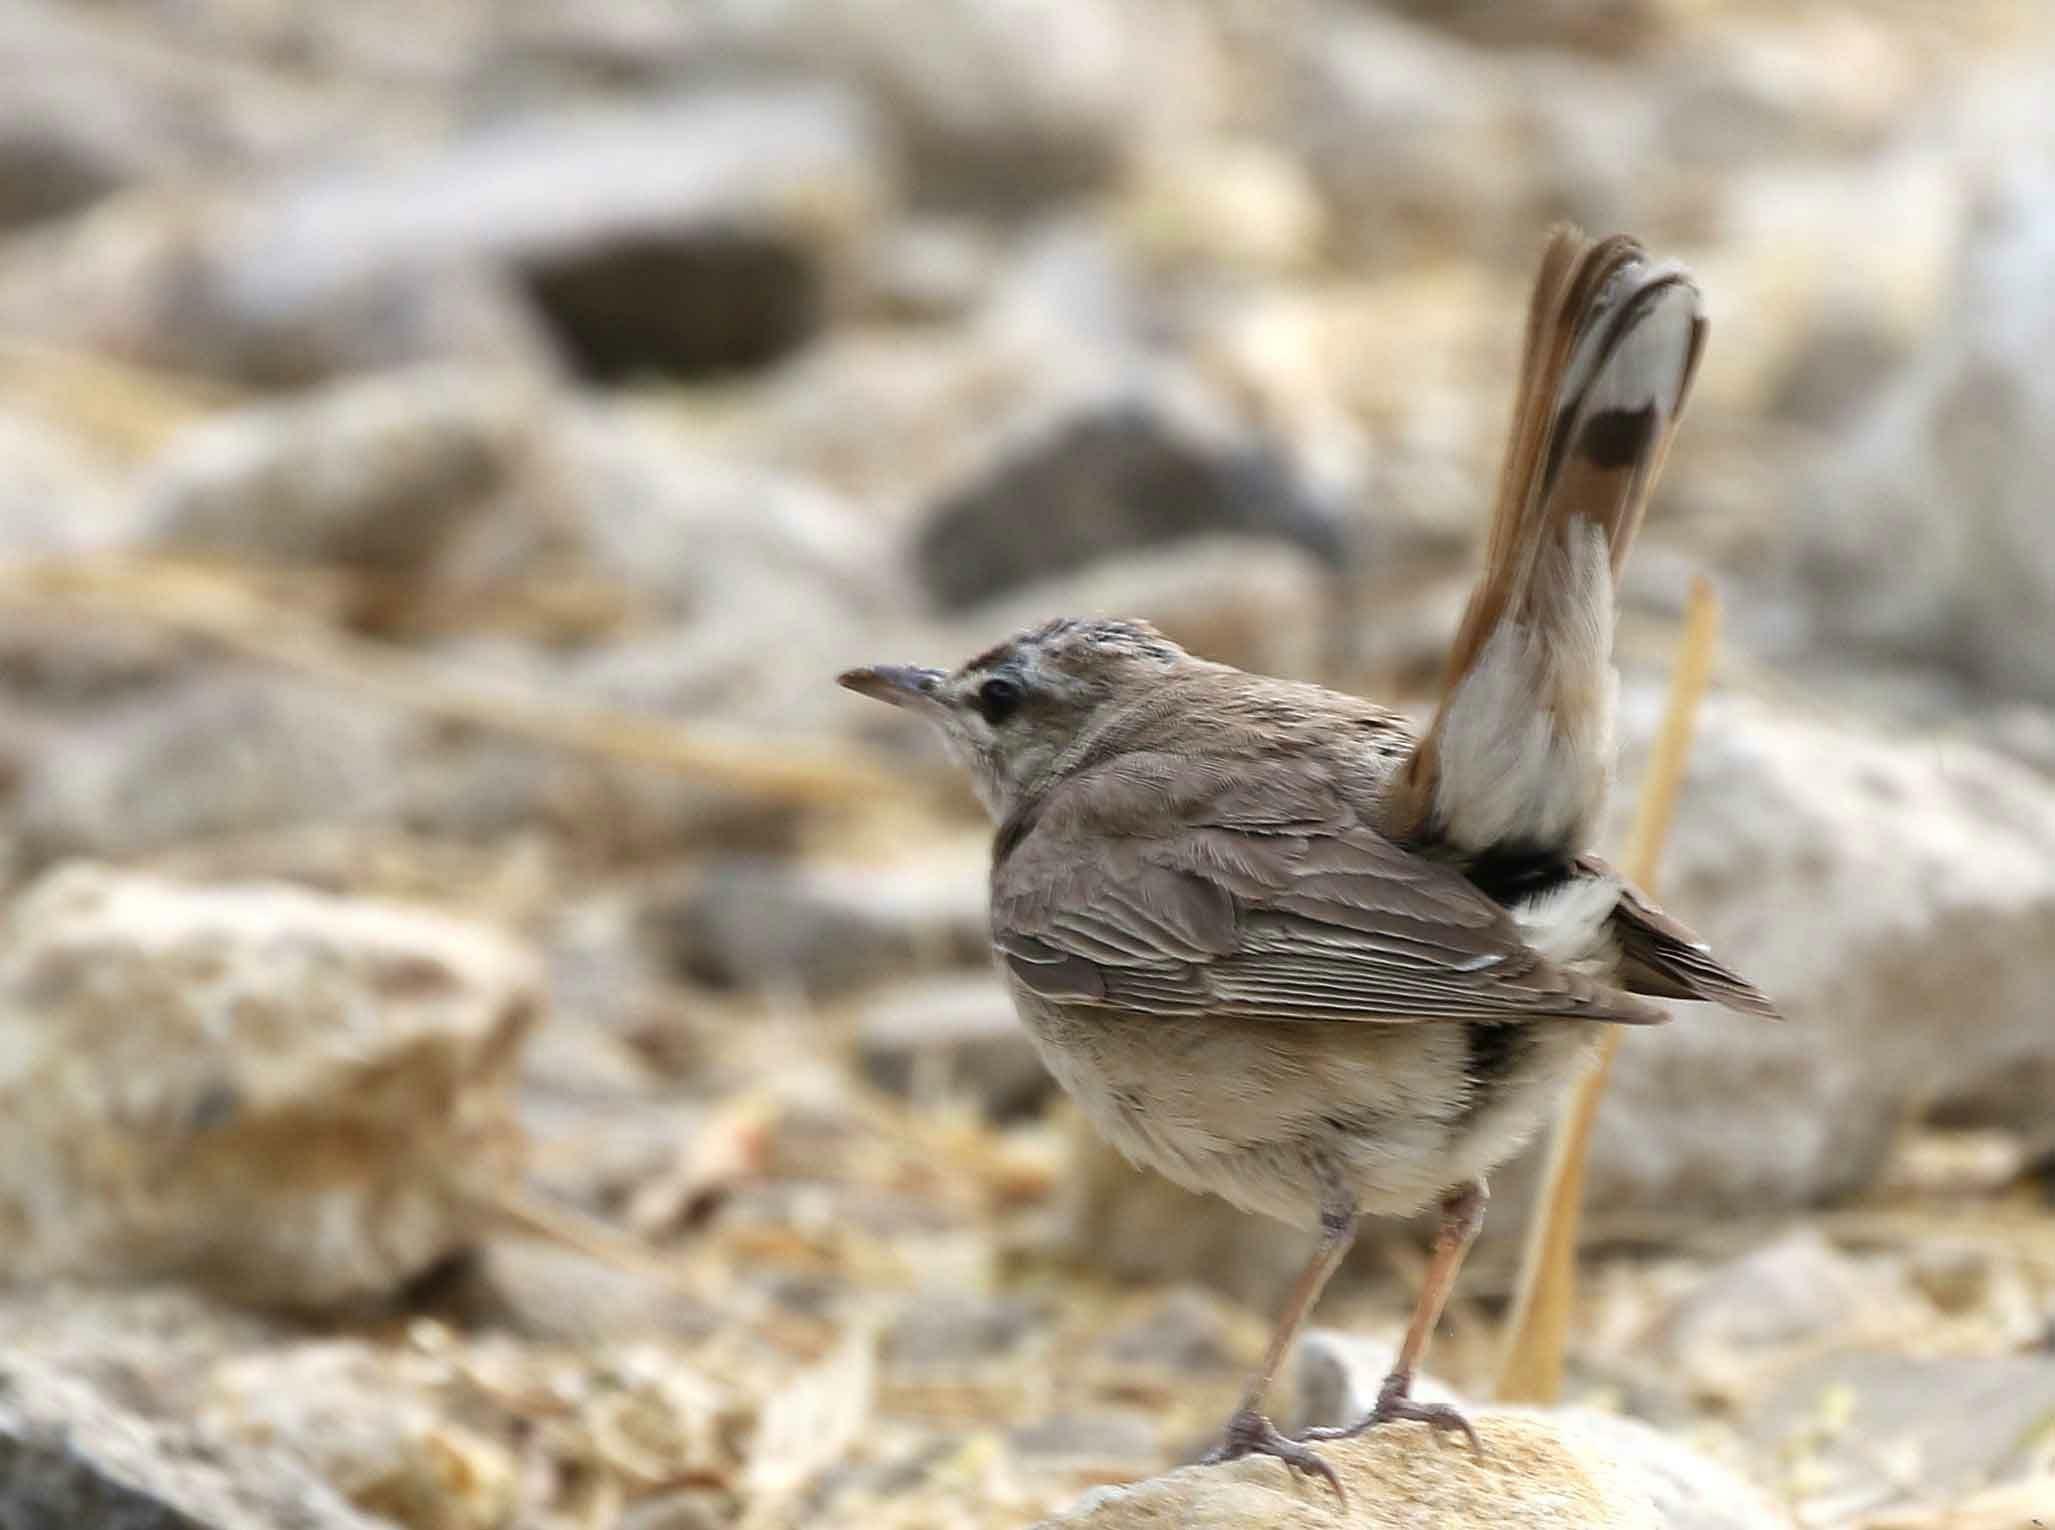 Rufous-tailed Scrub Robin on a rock